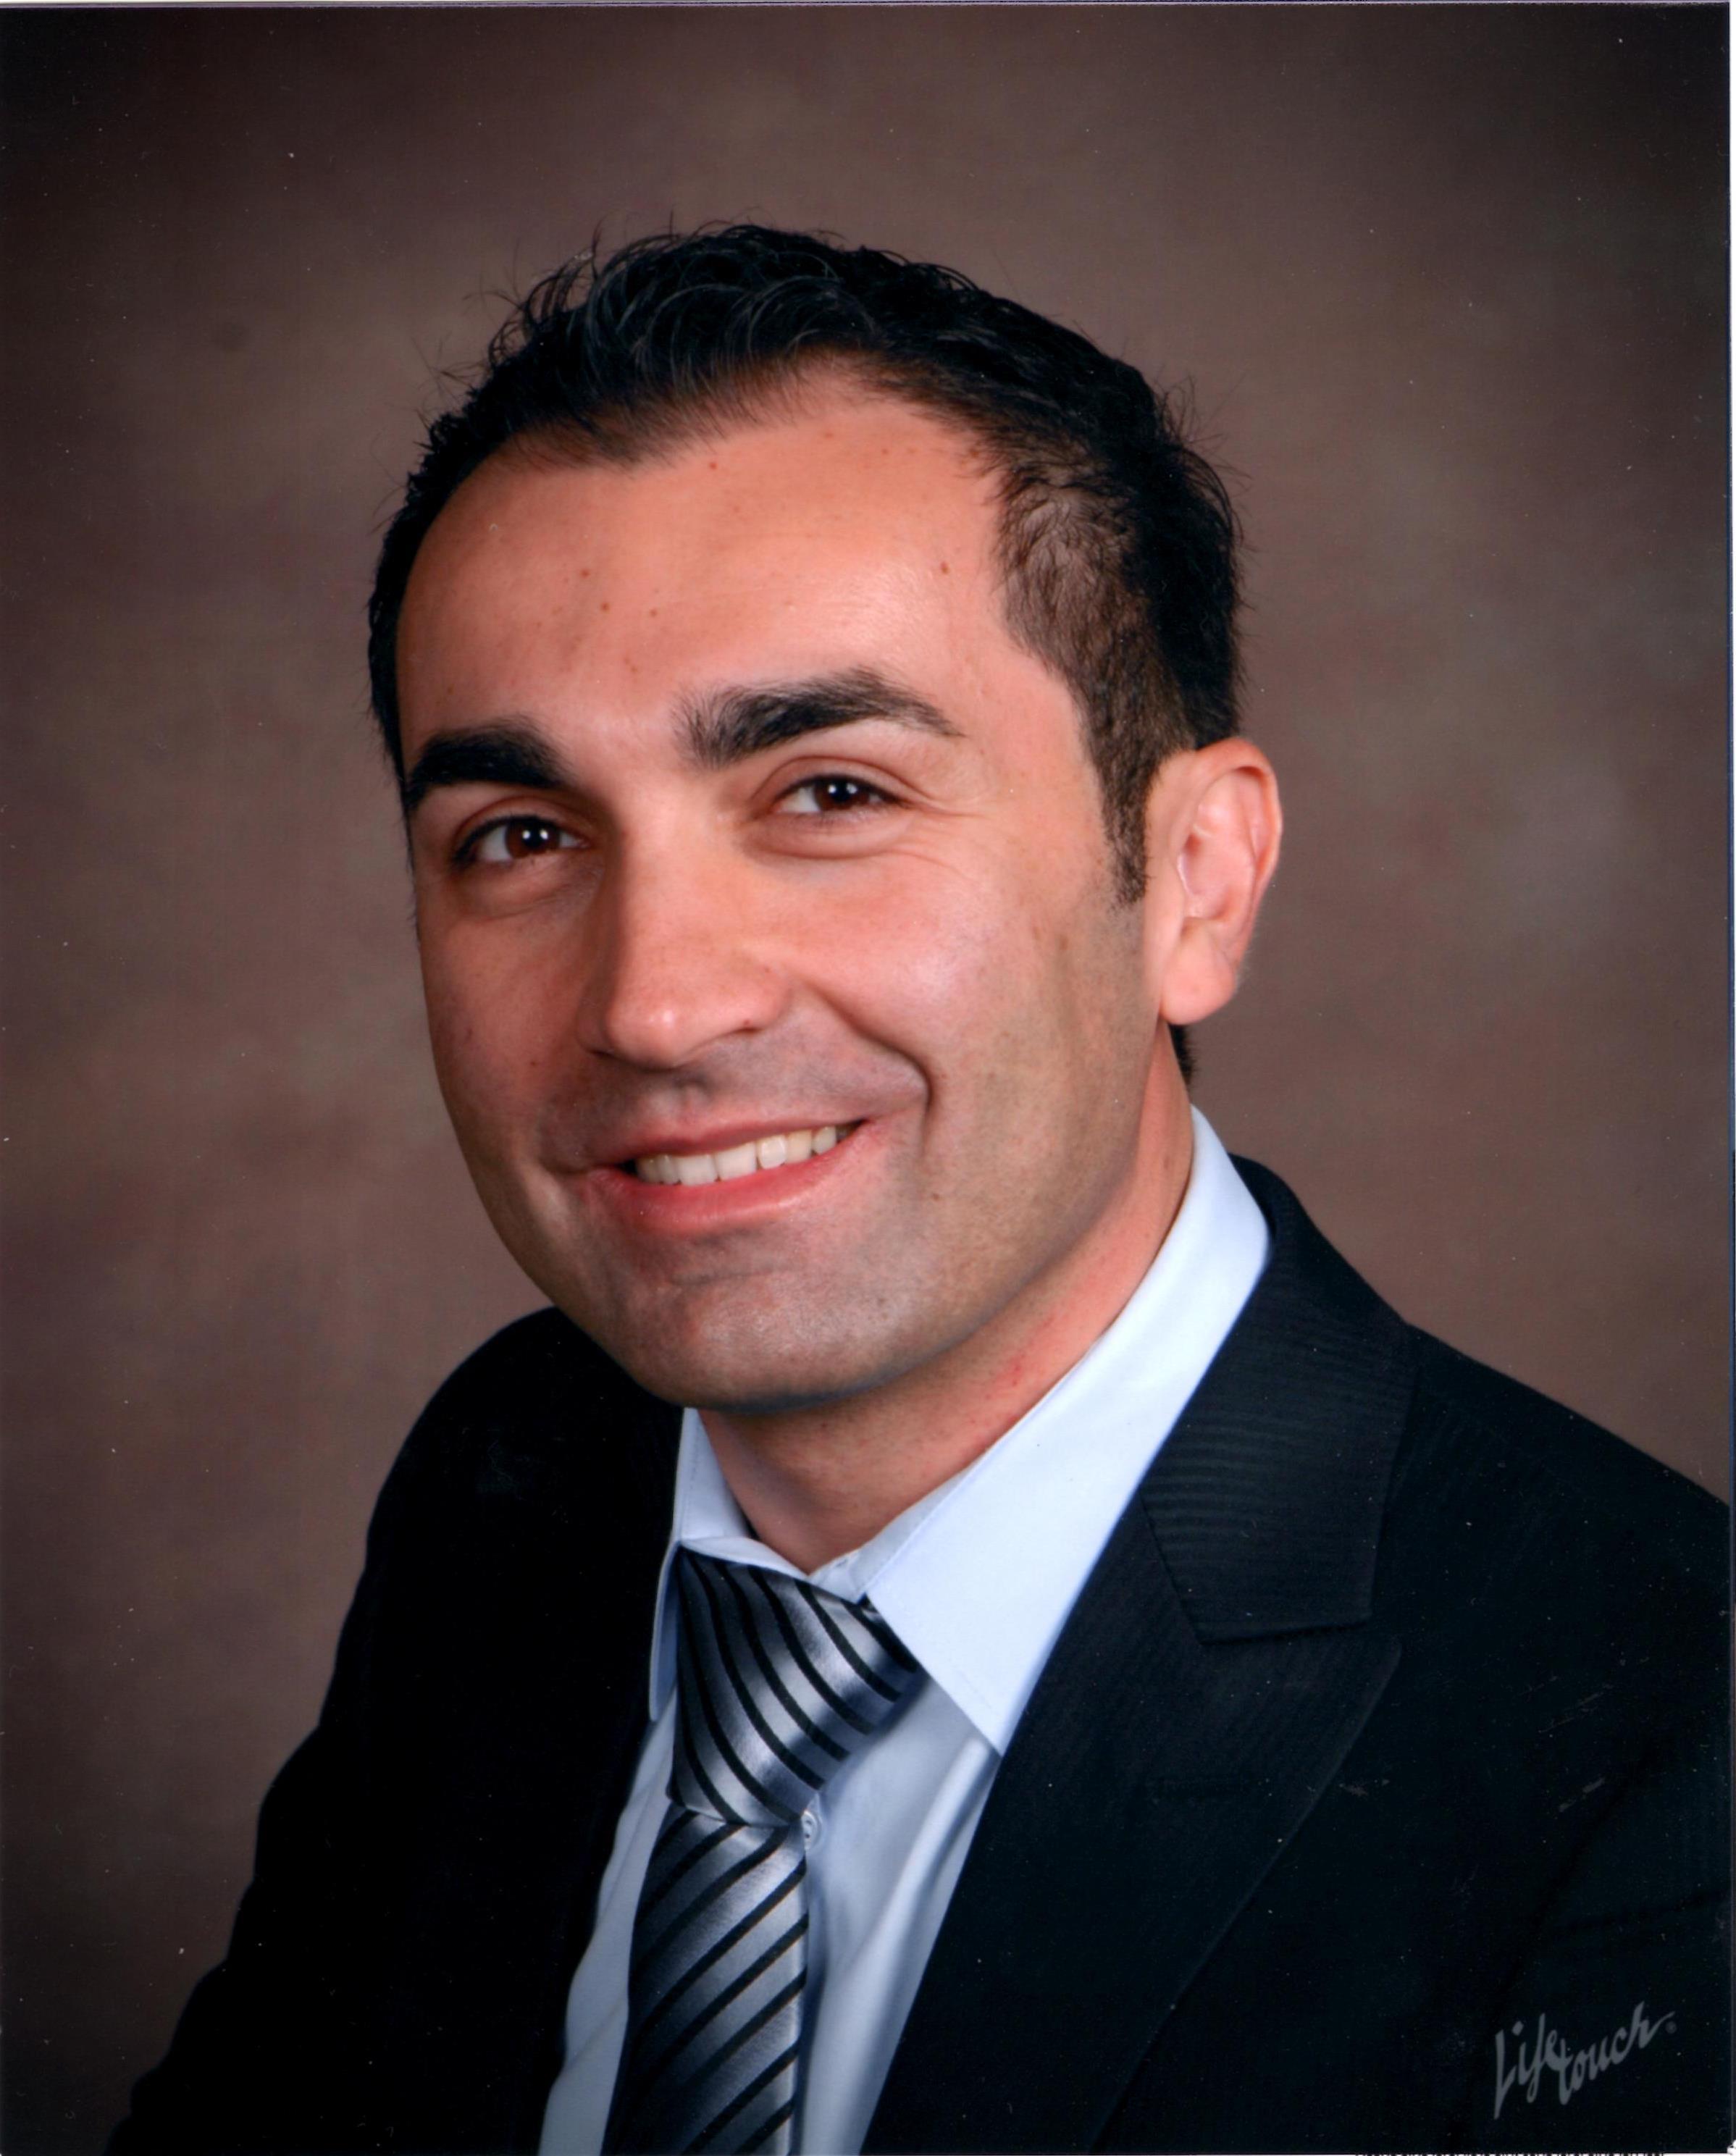 Carmine Clementelli, Sales and Marketing Manager, PFU - A Fujitsu Company